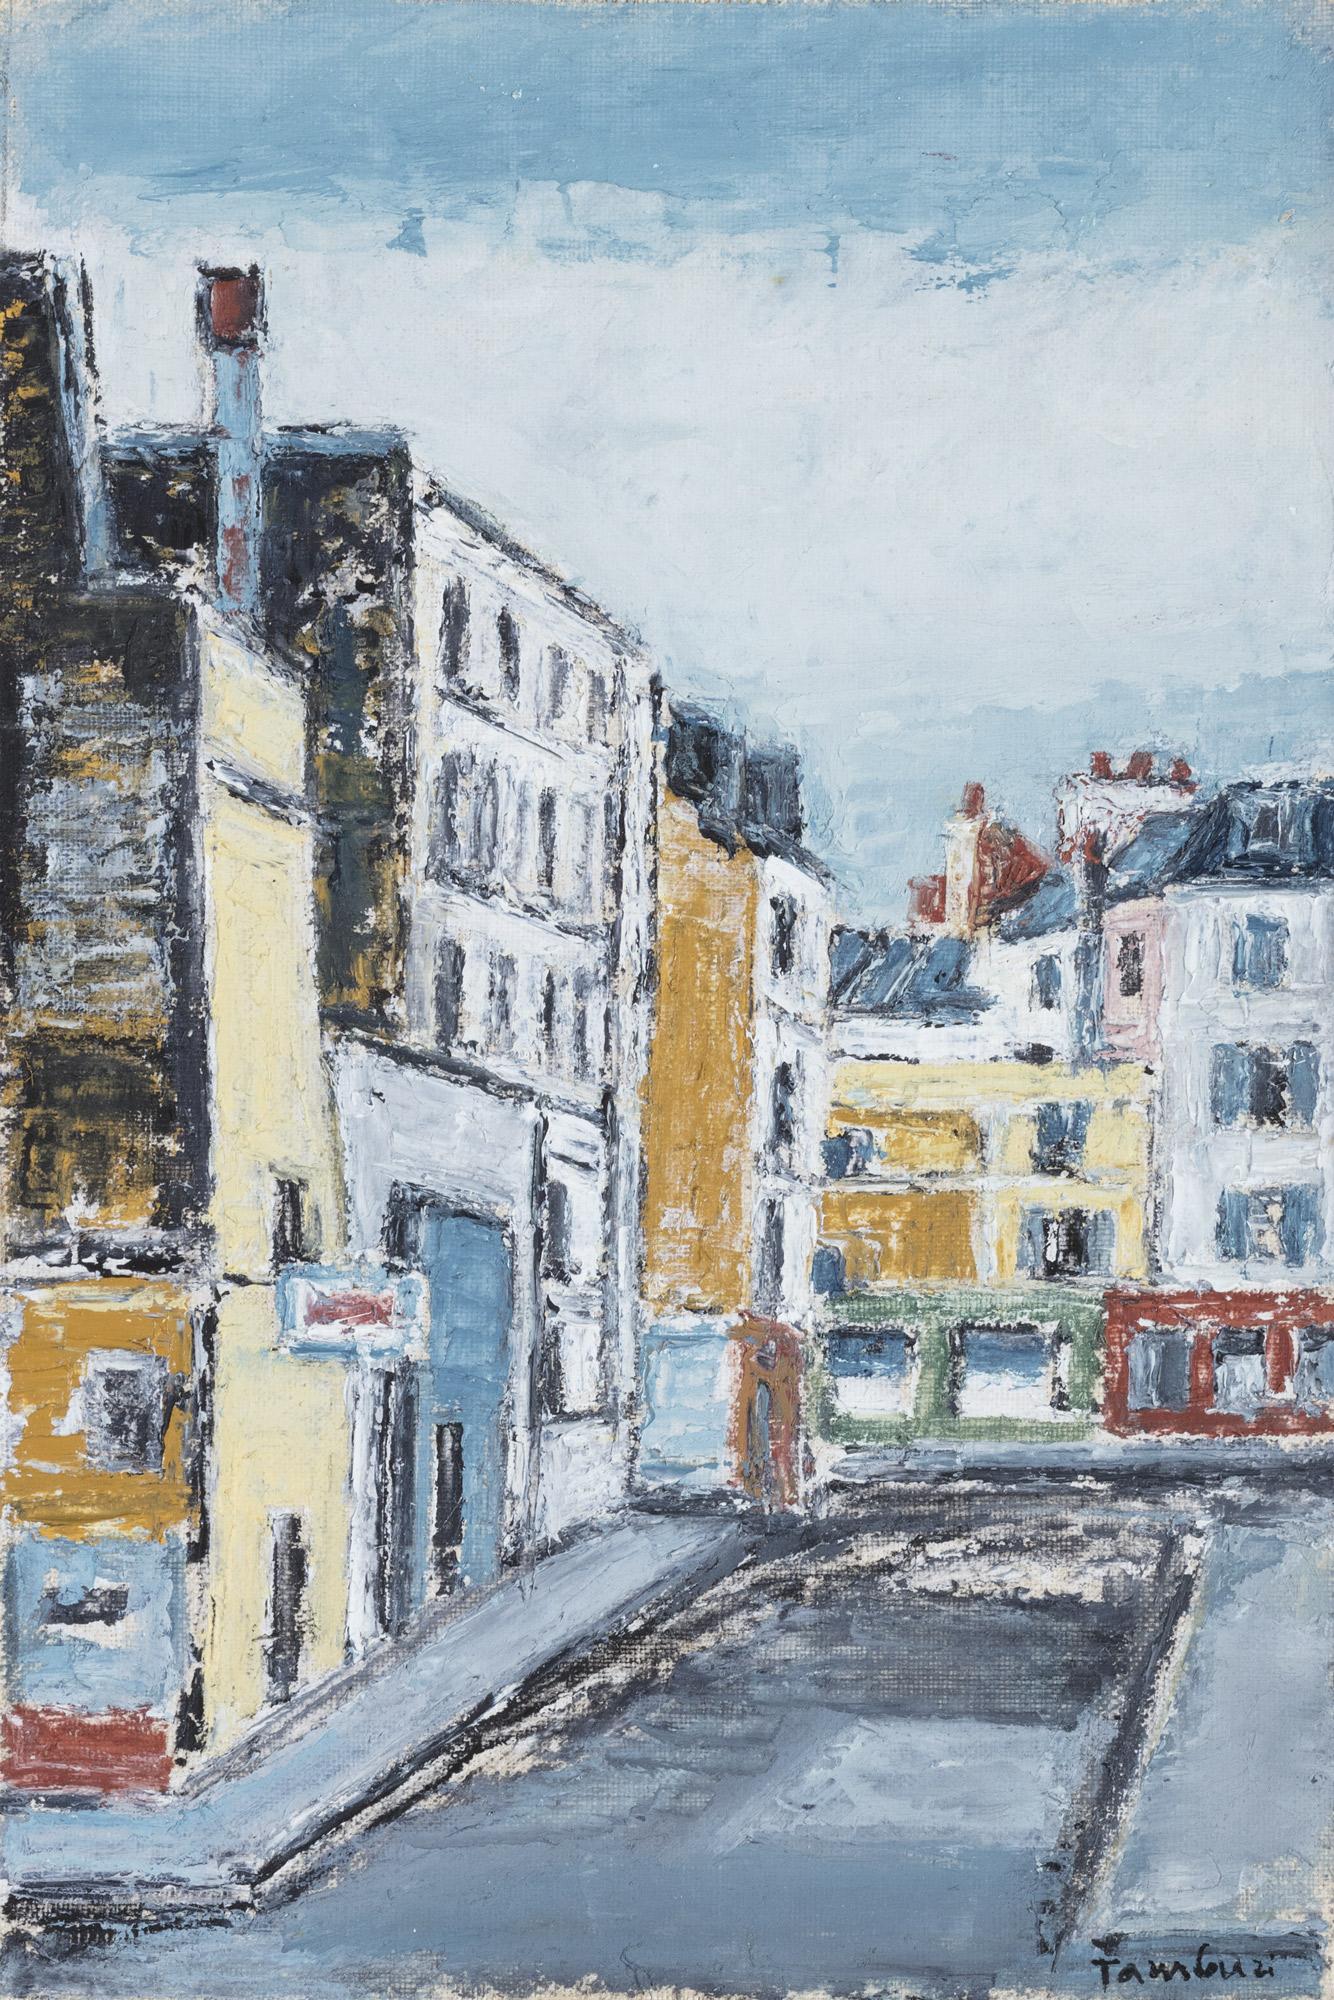 Strada a Rue du Foin, 1969